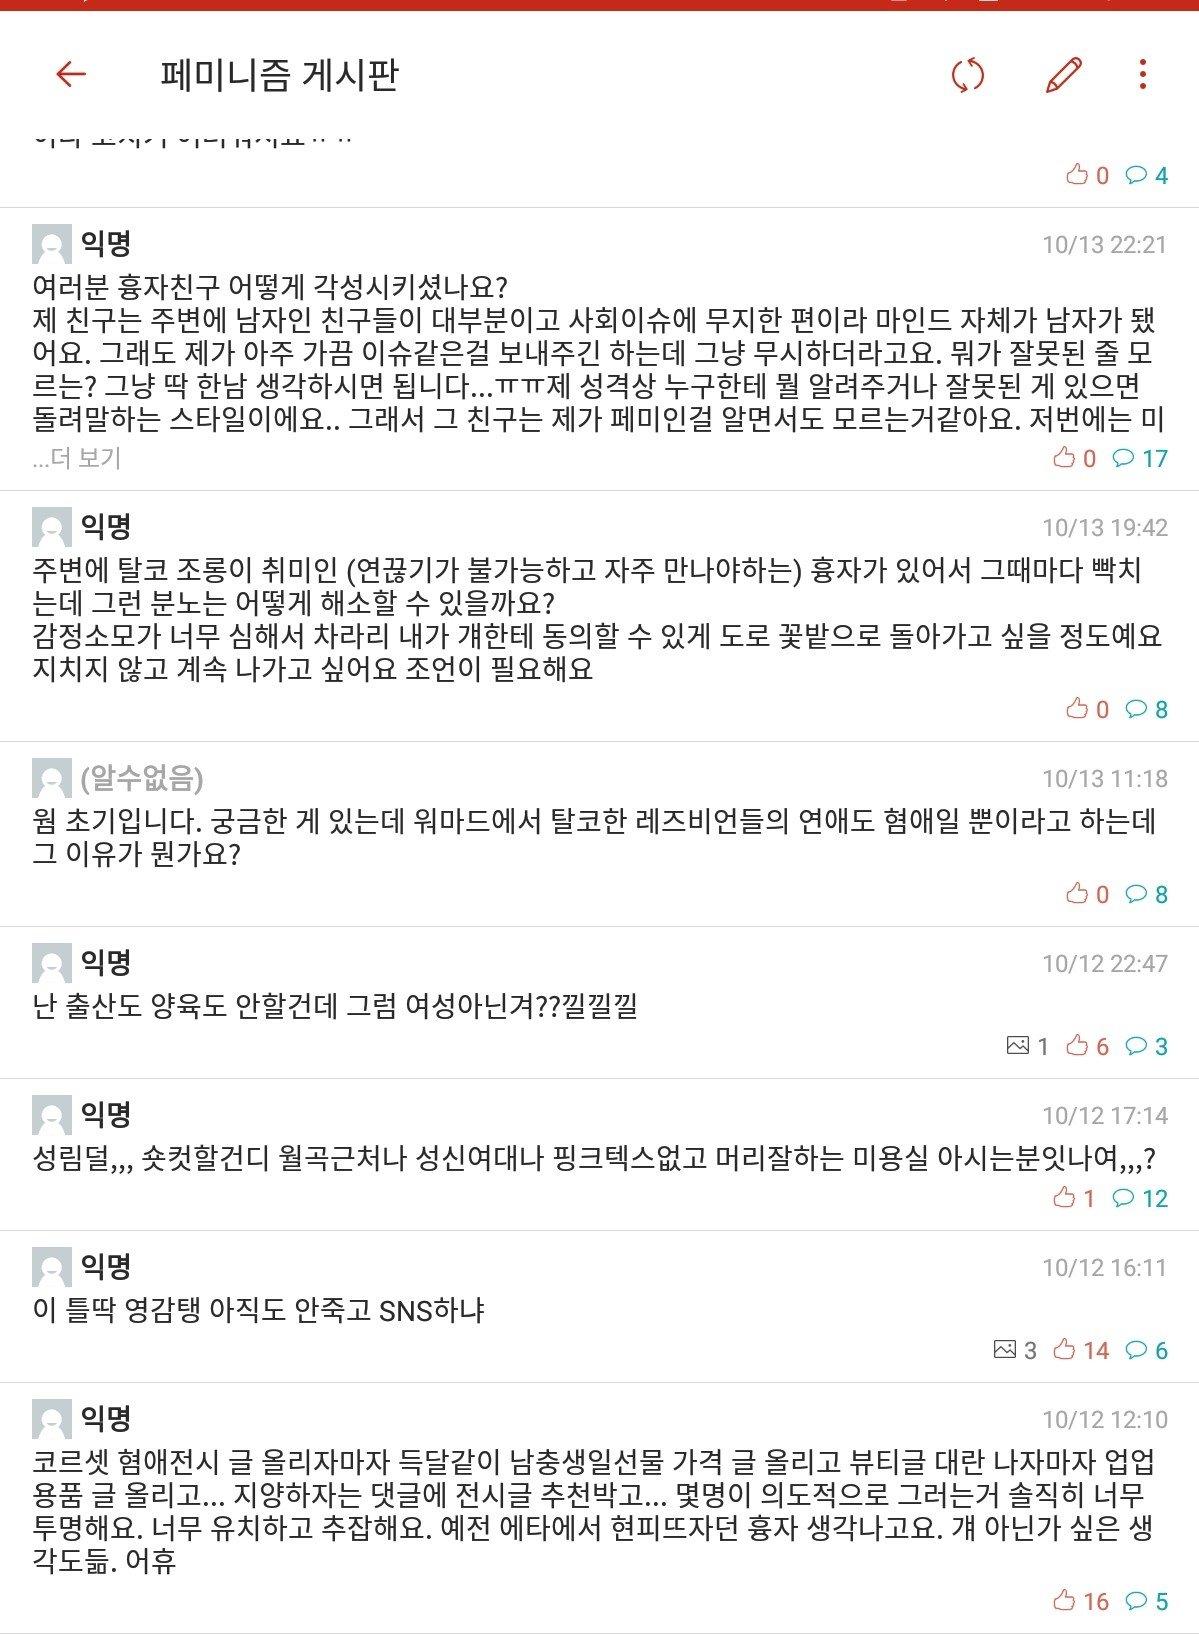 Screenshot_2018-10-31-14-15-19-384.jpeg (혐오)동덕여대 에타 게시판